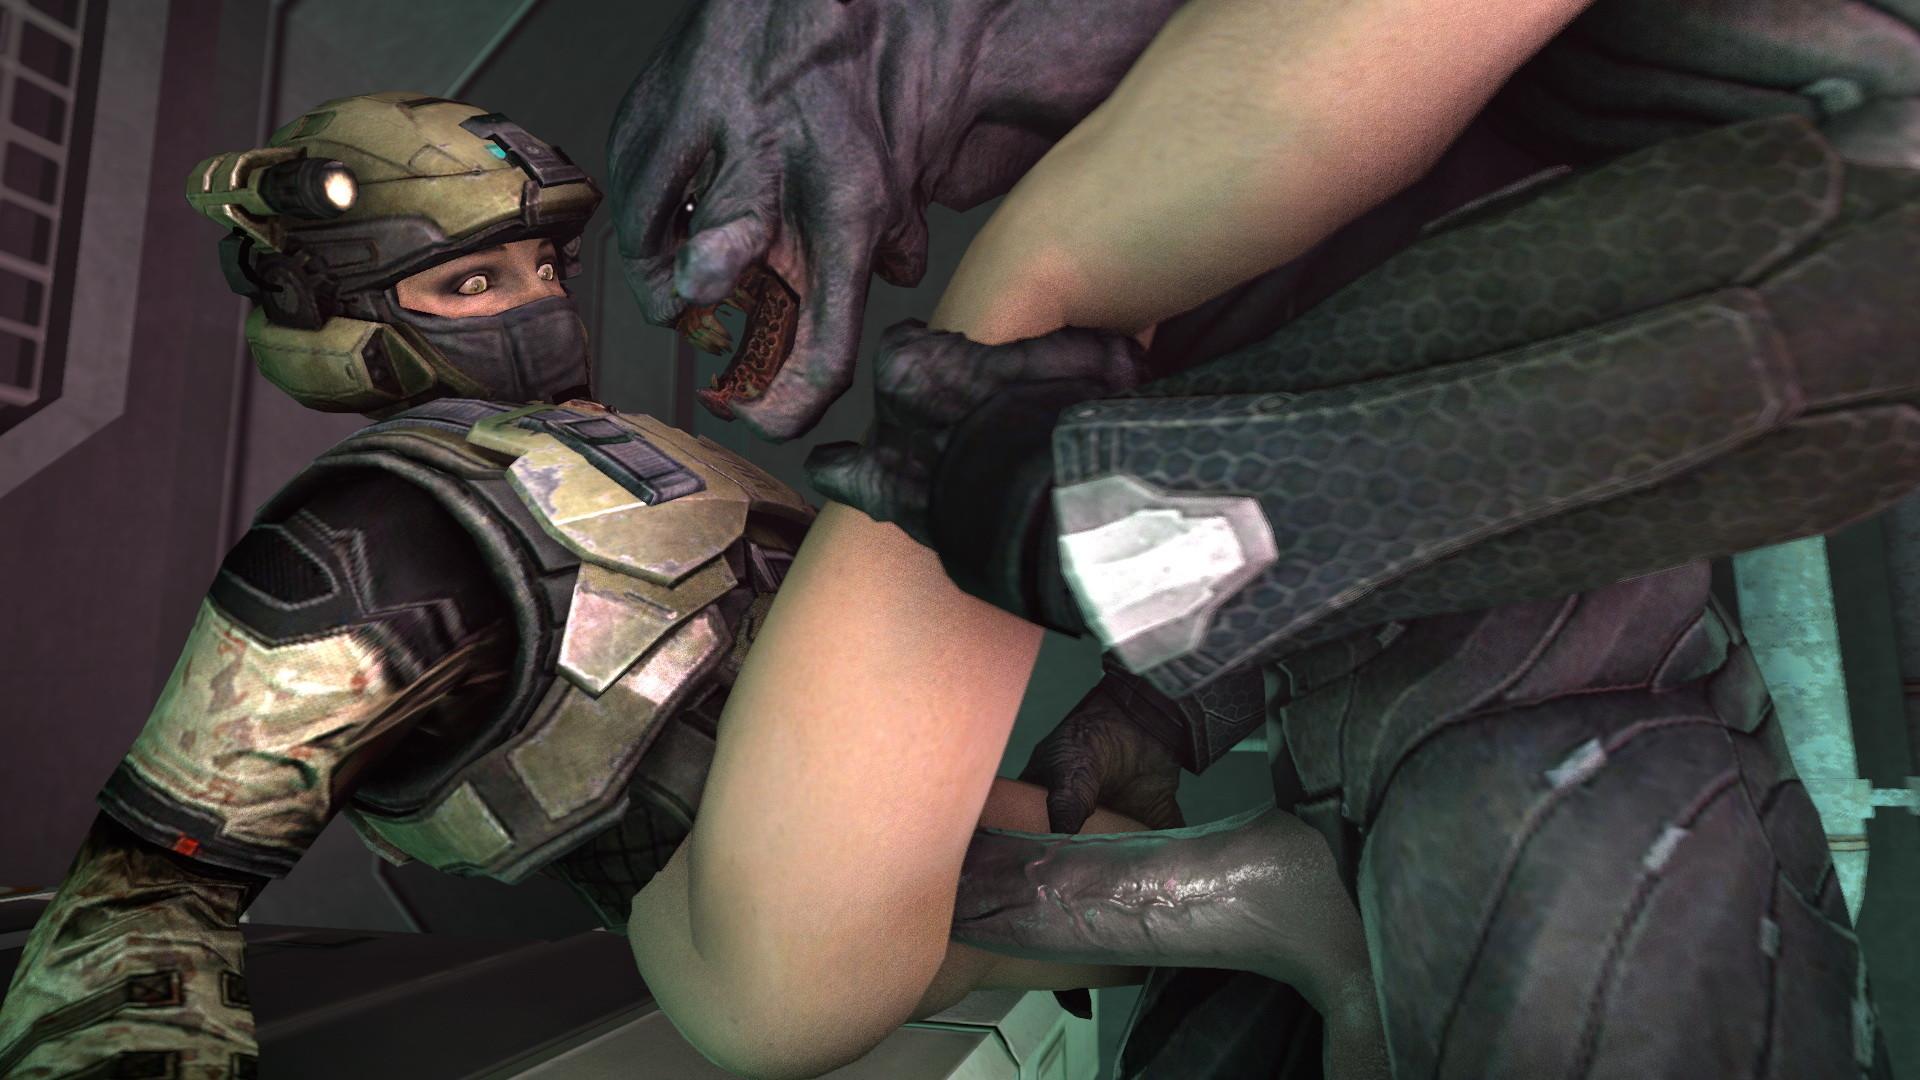 Halo mcc matchmaking bugs